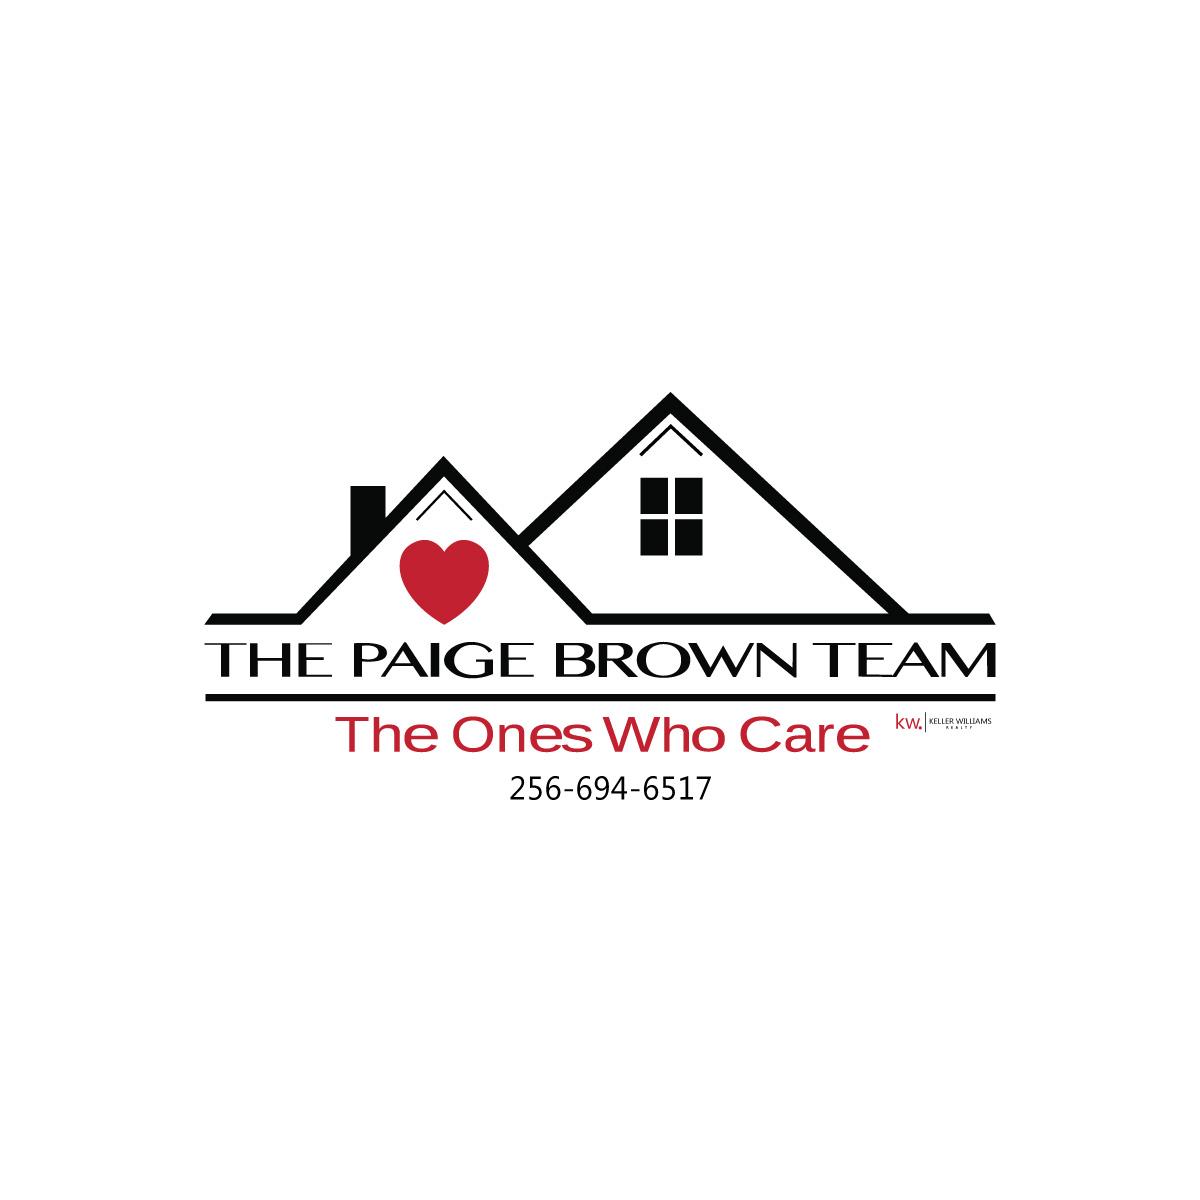 The Paige Brown Team.jpg